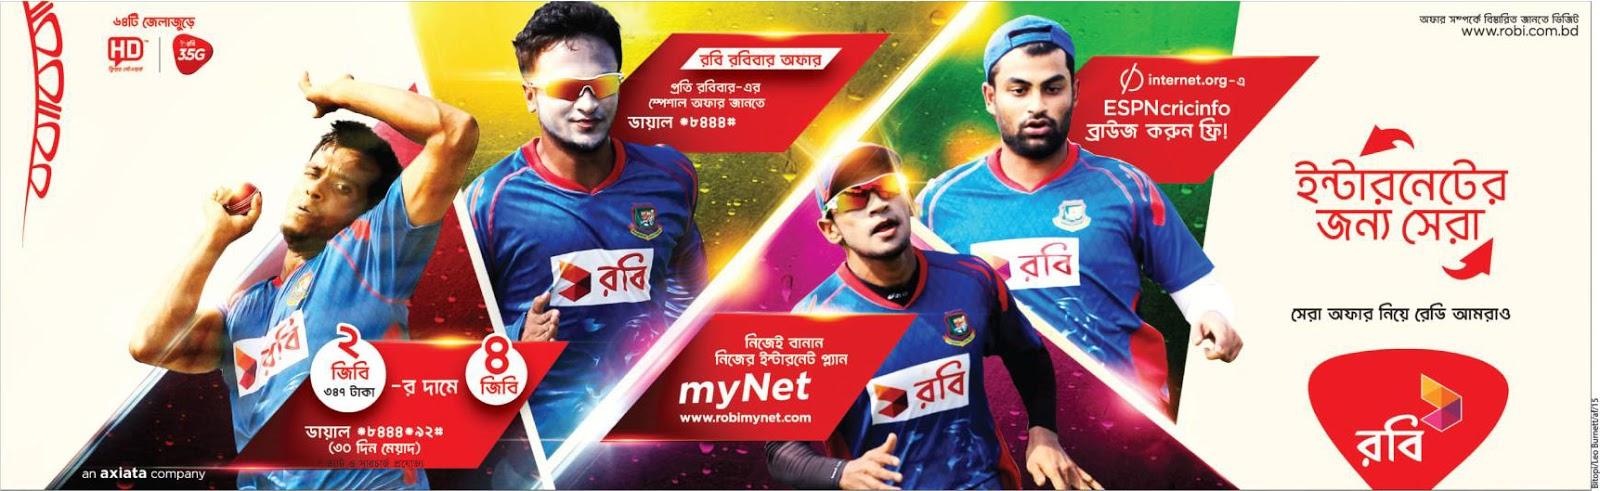 Advertising Archive Bangladesh: Jun 12, 2015